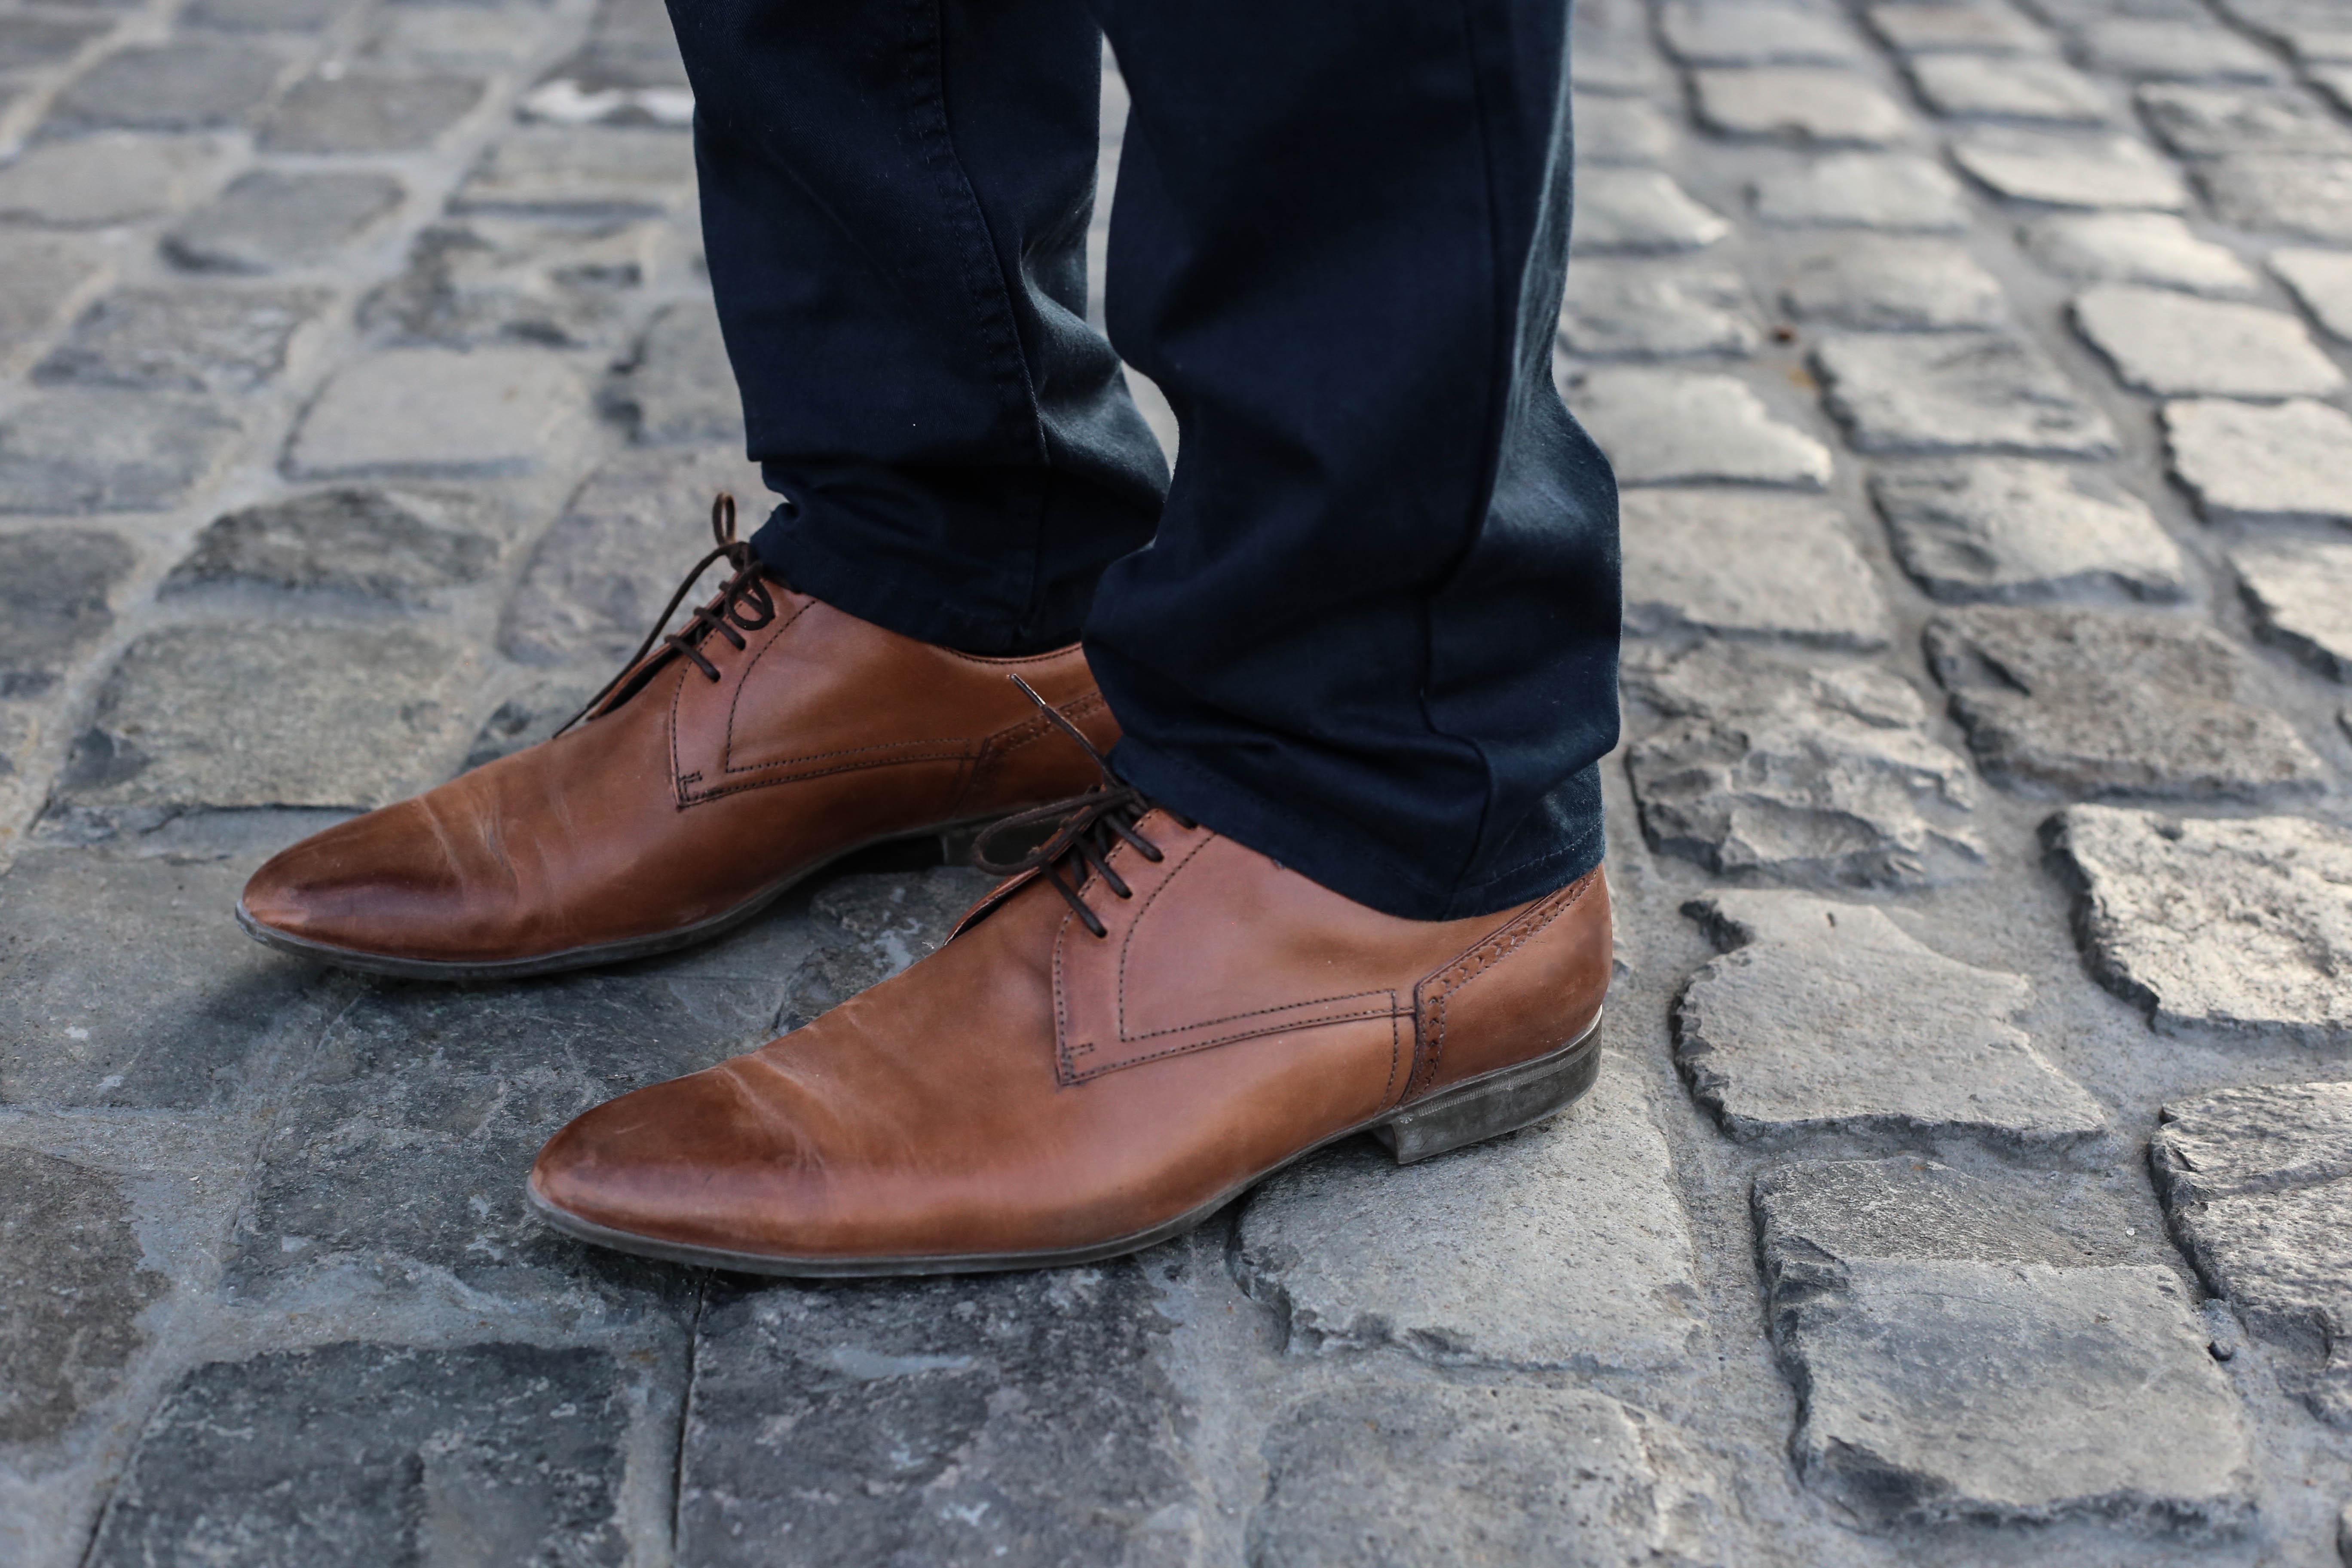 hellblaues-sakko-smart-casual-look-menfashion-fashionblog-berlin_7888